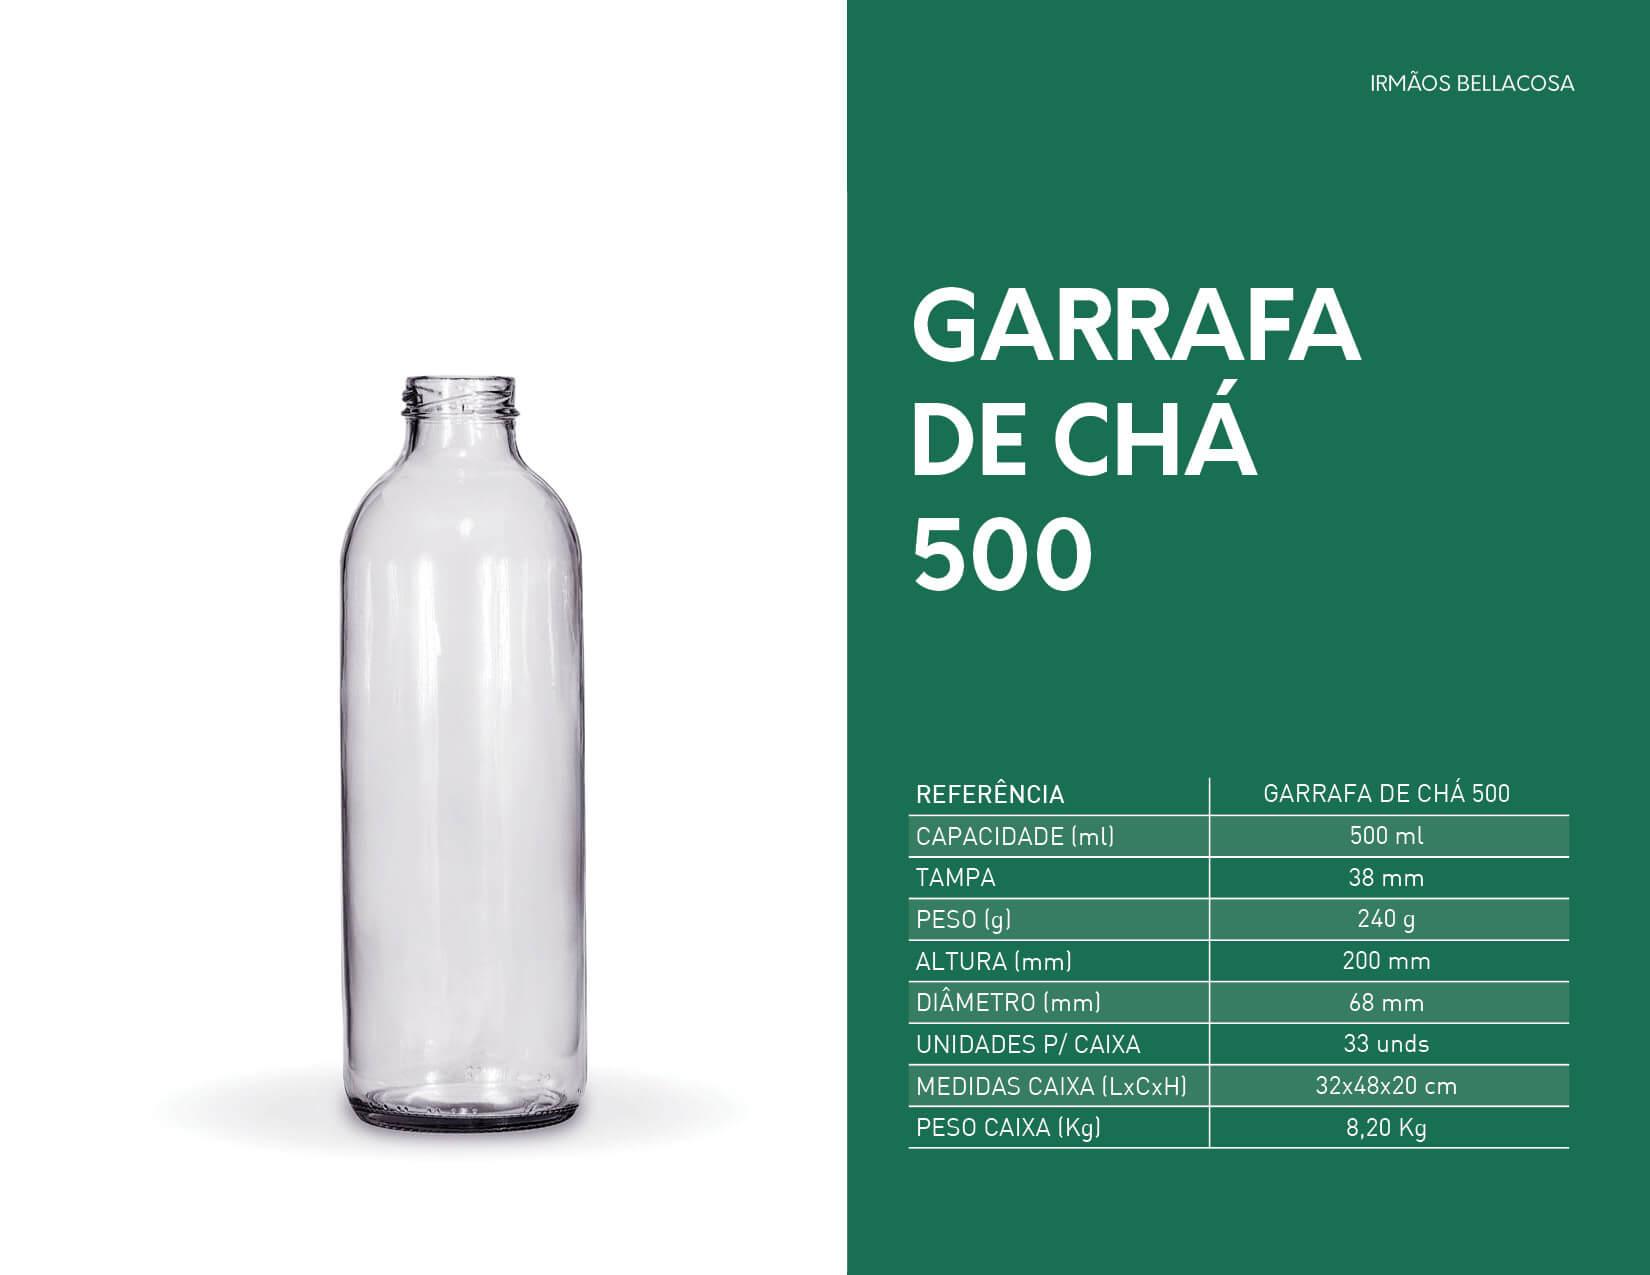 045-Garrafa-de-cha-500-irmaos-bellacosa-embalagens-de-vidro